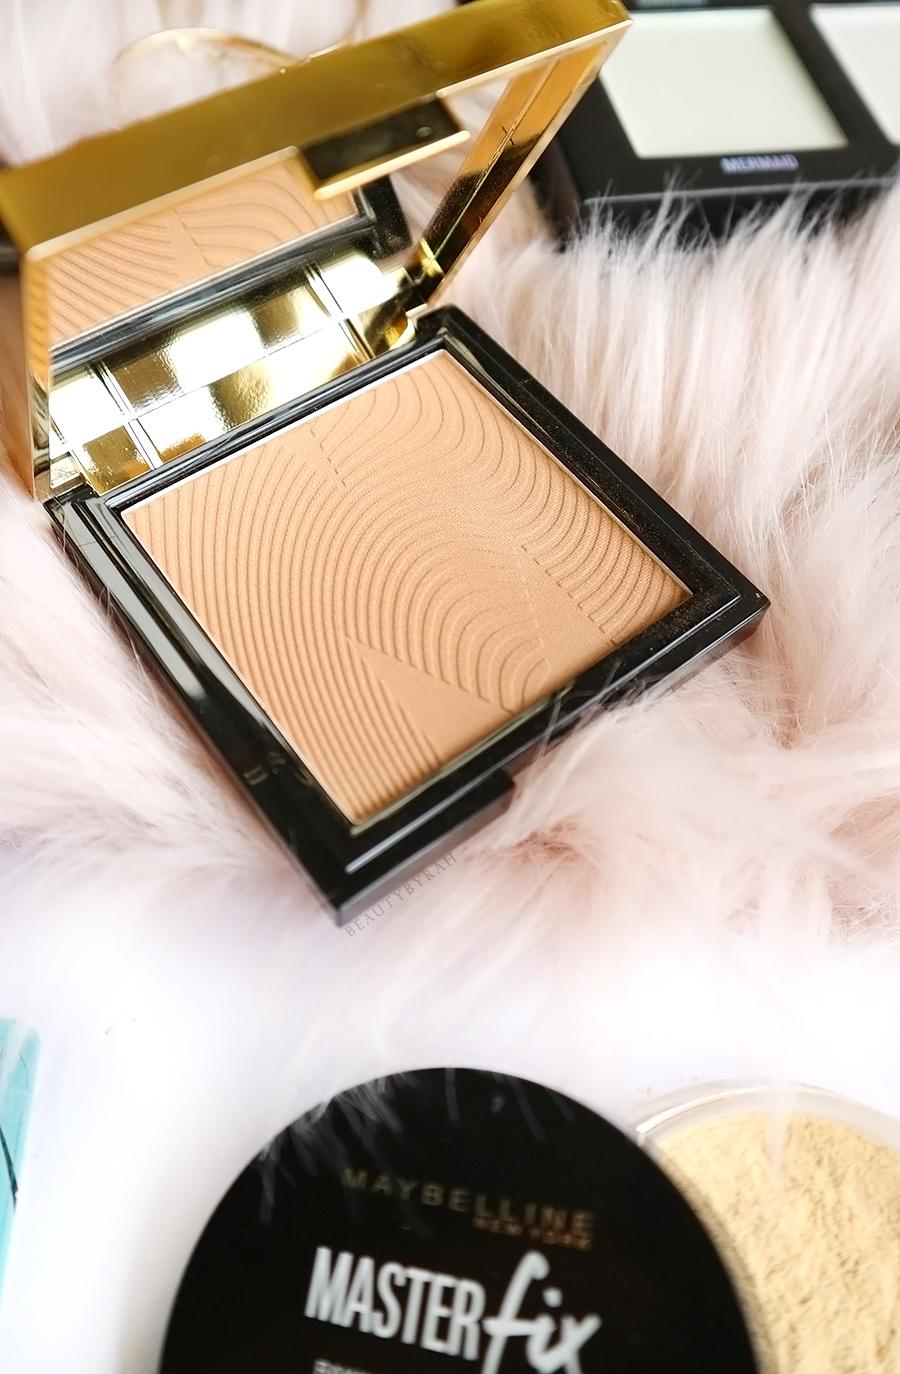 Mecca Max Sunlit Skin Bronzing Powder in Medium Review